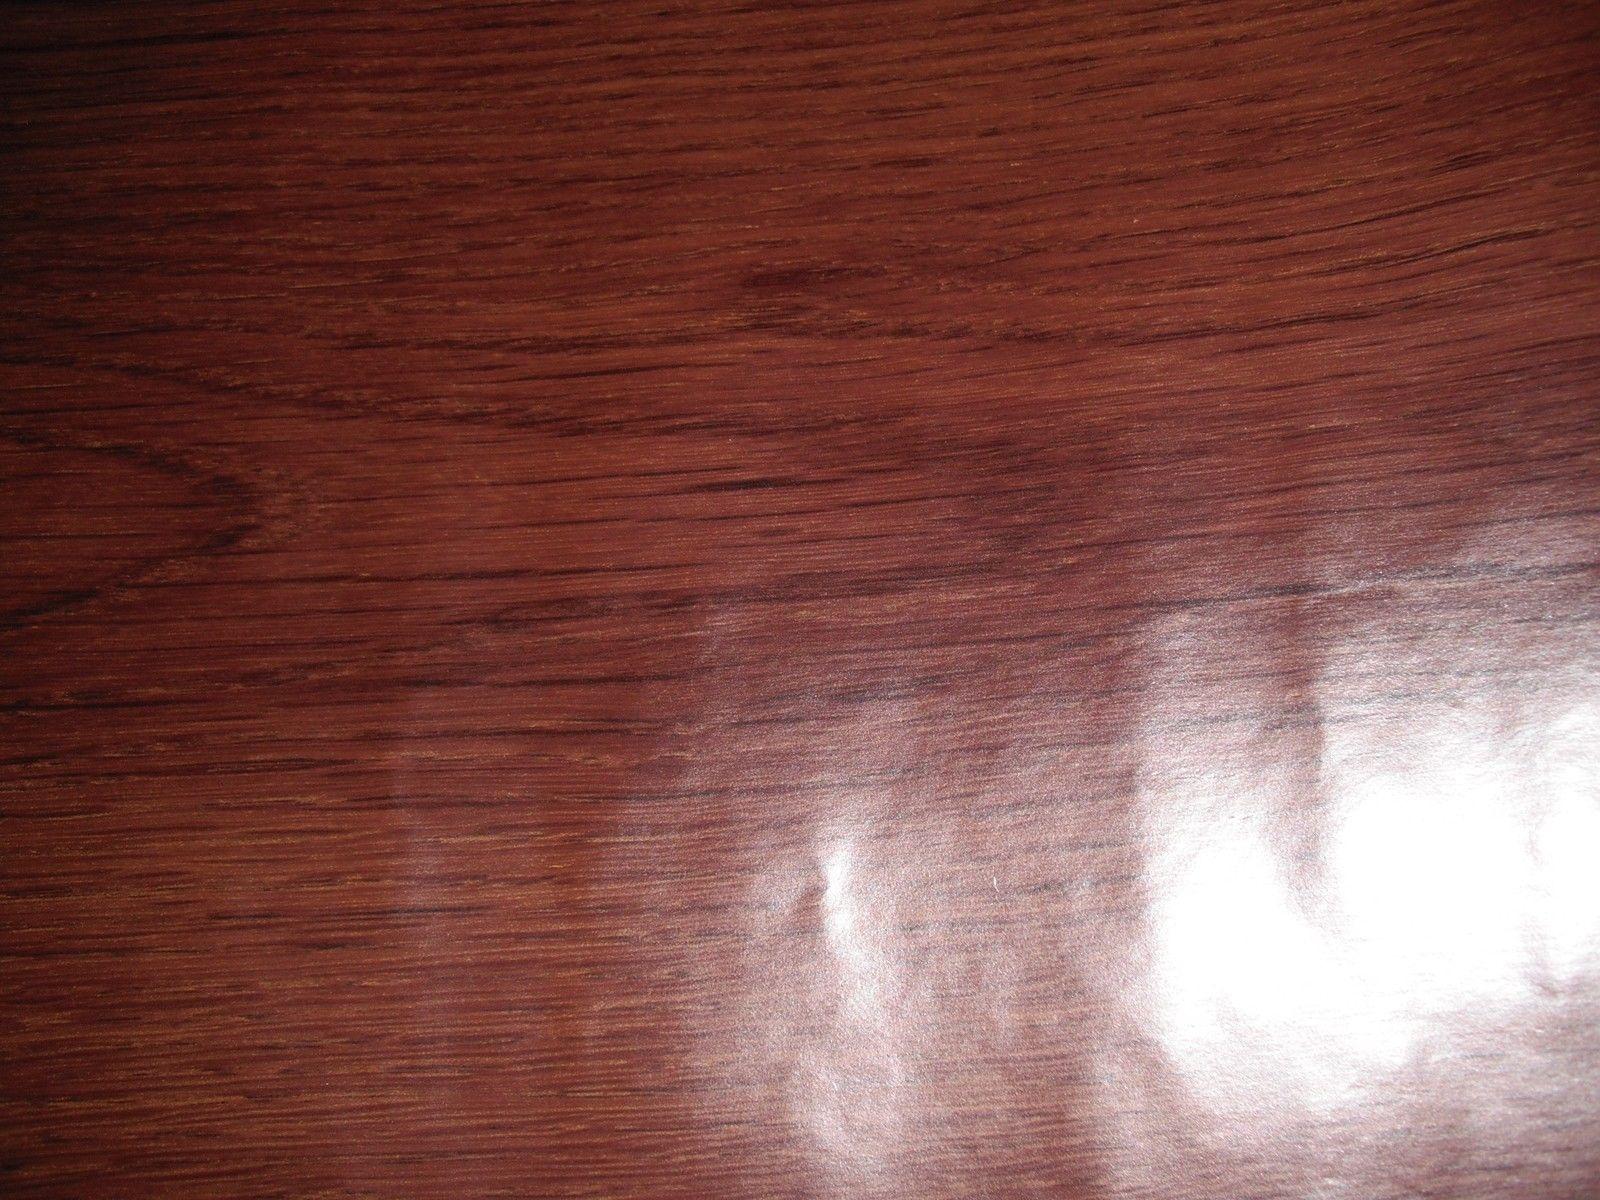 Antique Birch Dark Shelf Liner Paper Crafts Shelving Contact Drawer 1600x1200